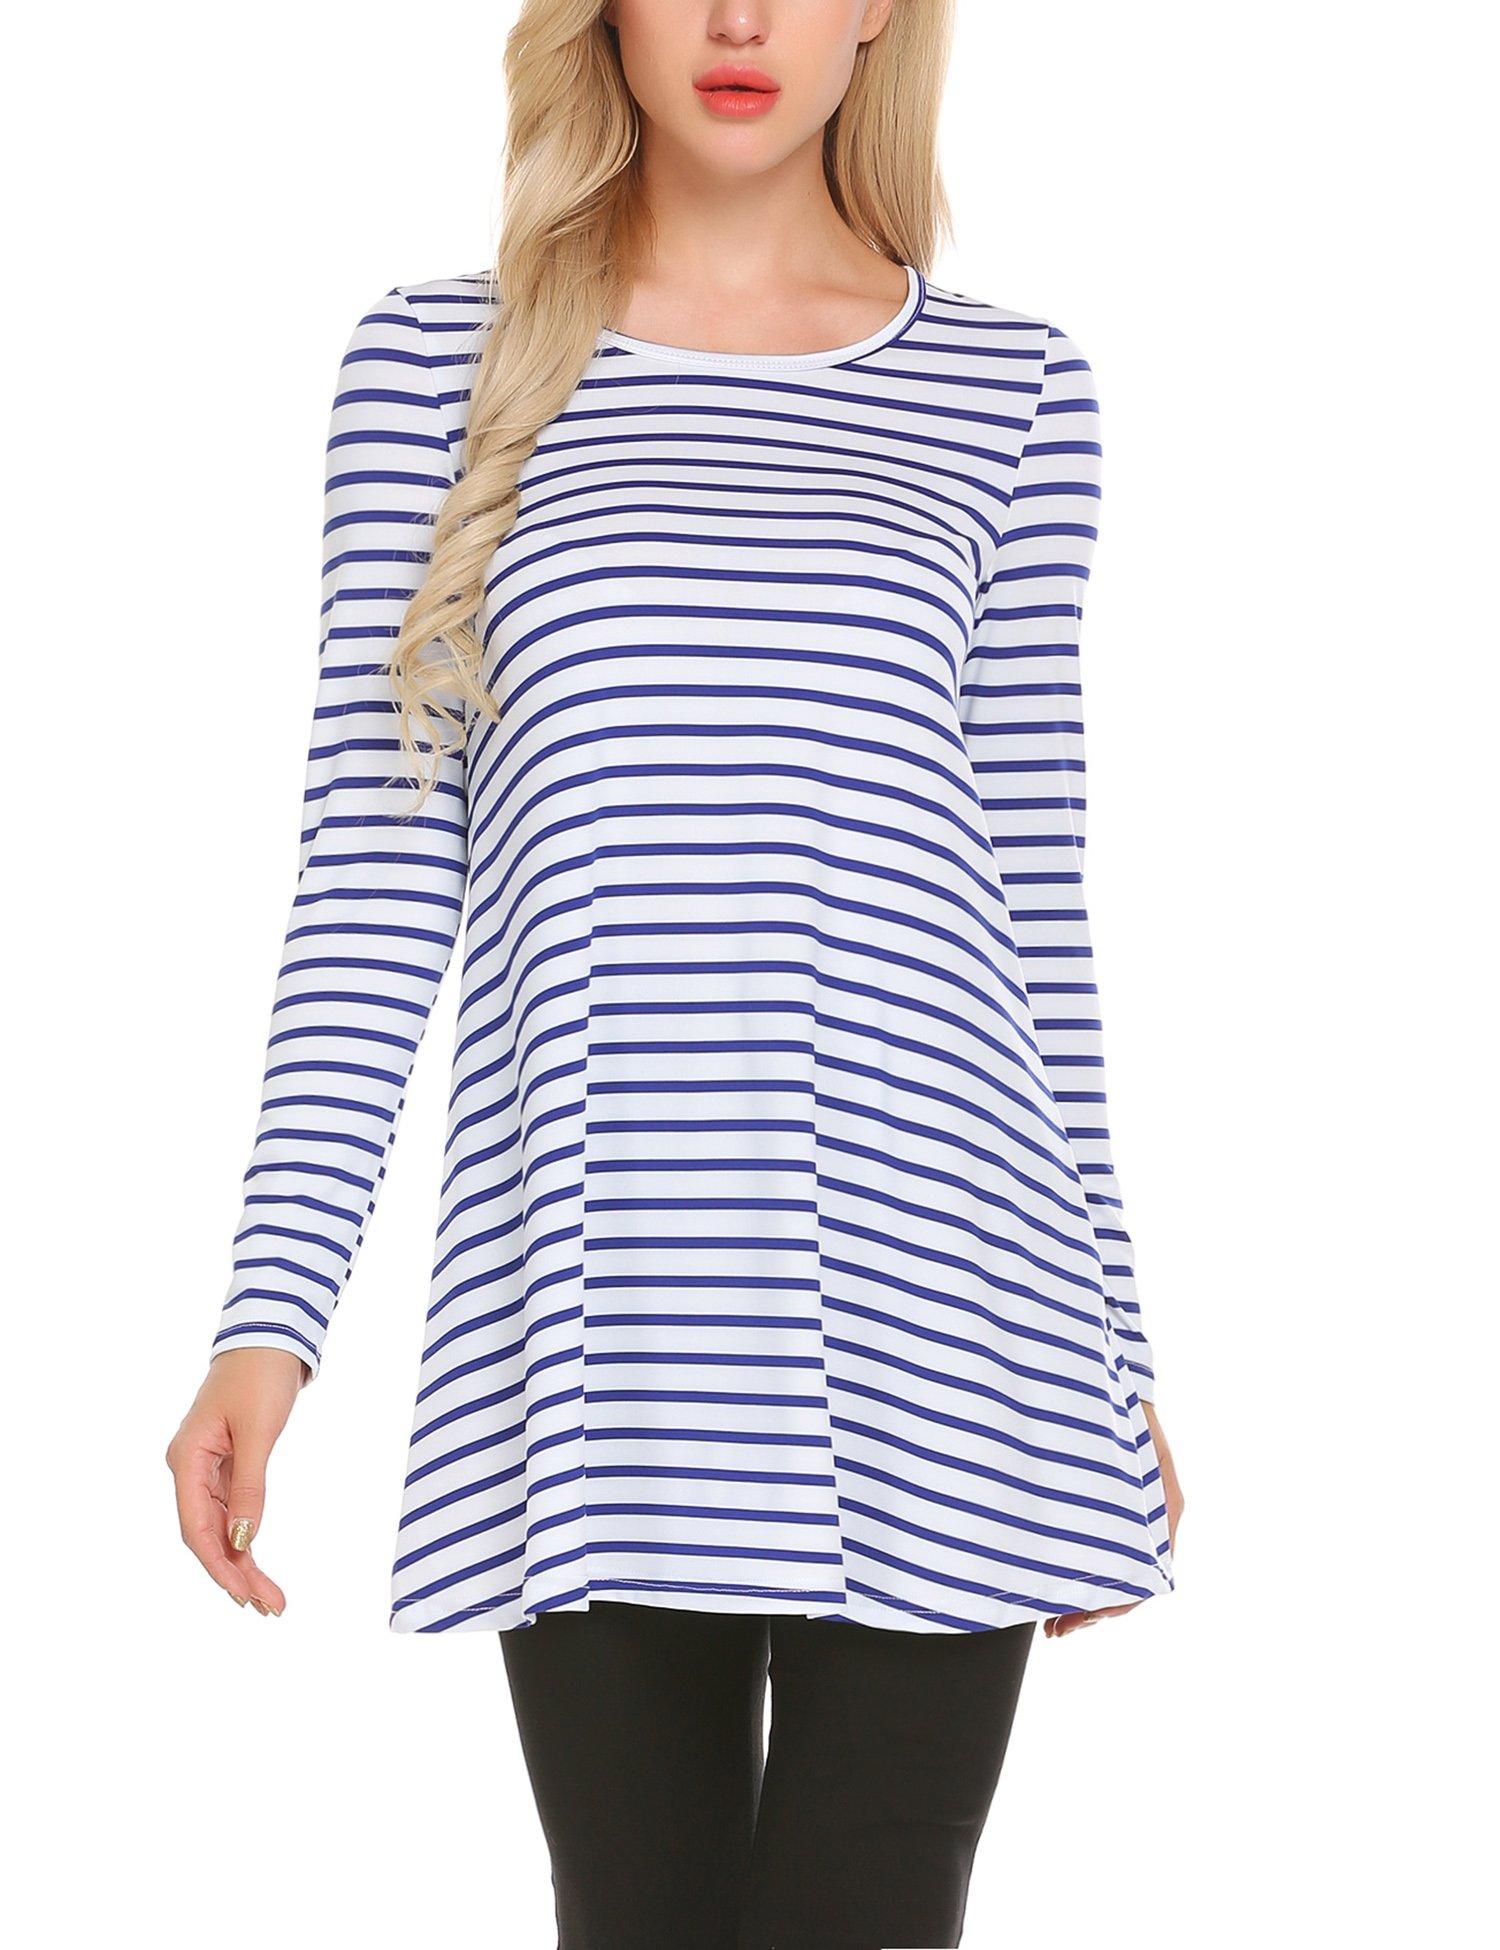 L\'AMORE Damen Basic Shirt Streifen 3/4 Ärmel Oberteil Casual Bluse Longshirt